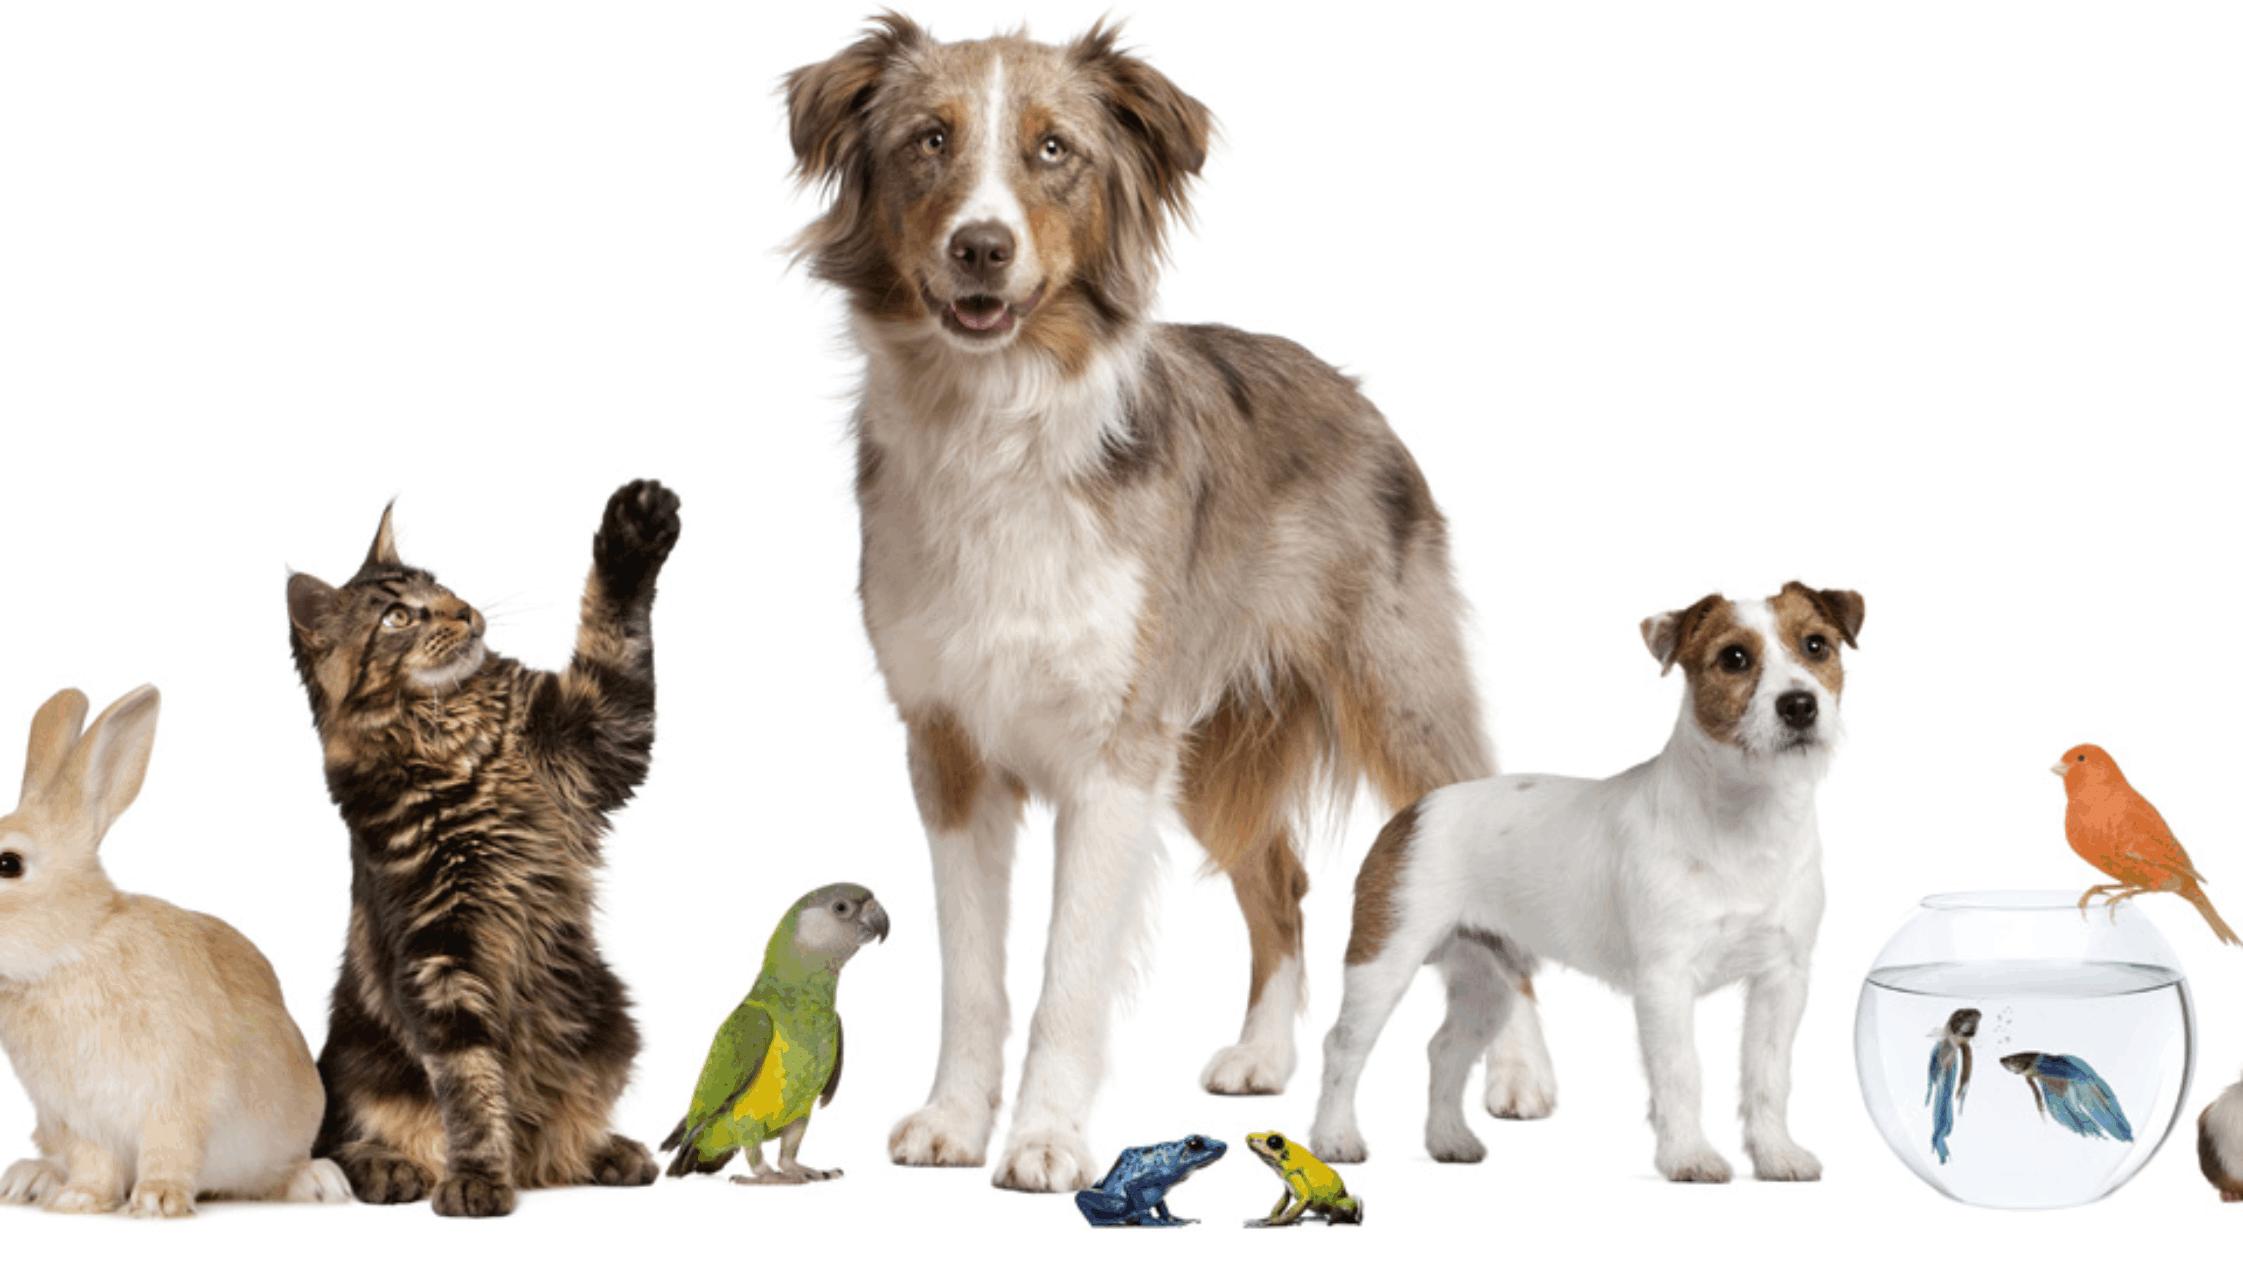 mascotas Pros y contras de tener una mascota Pros y contras de tener una mascota mascotas 1